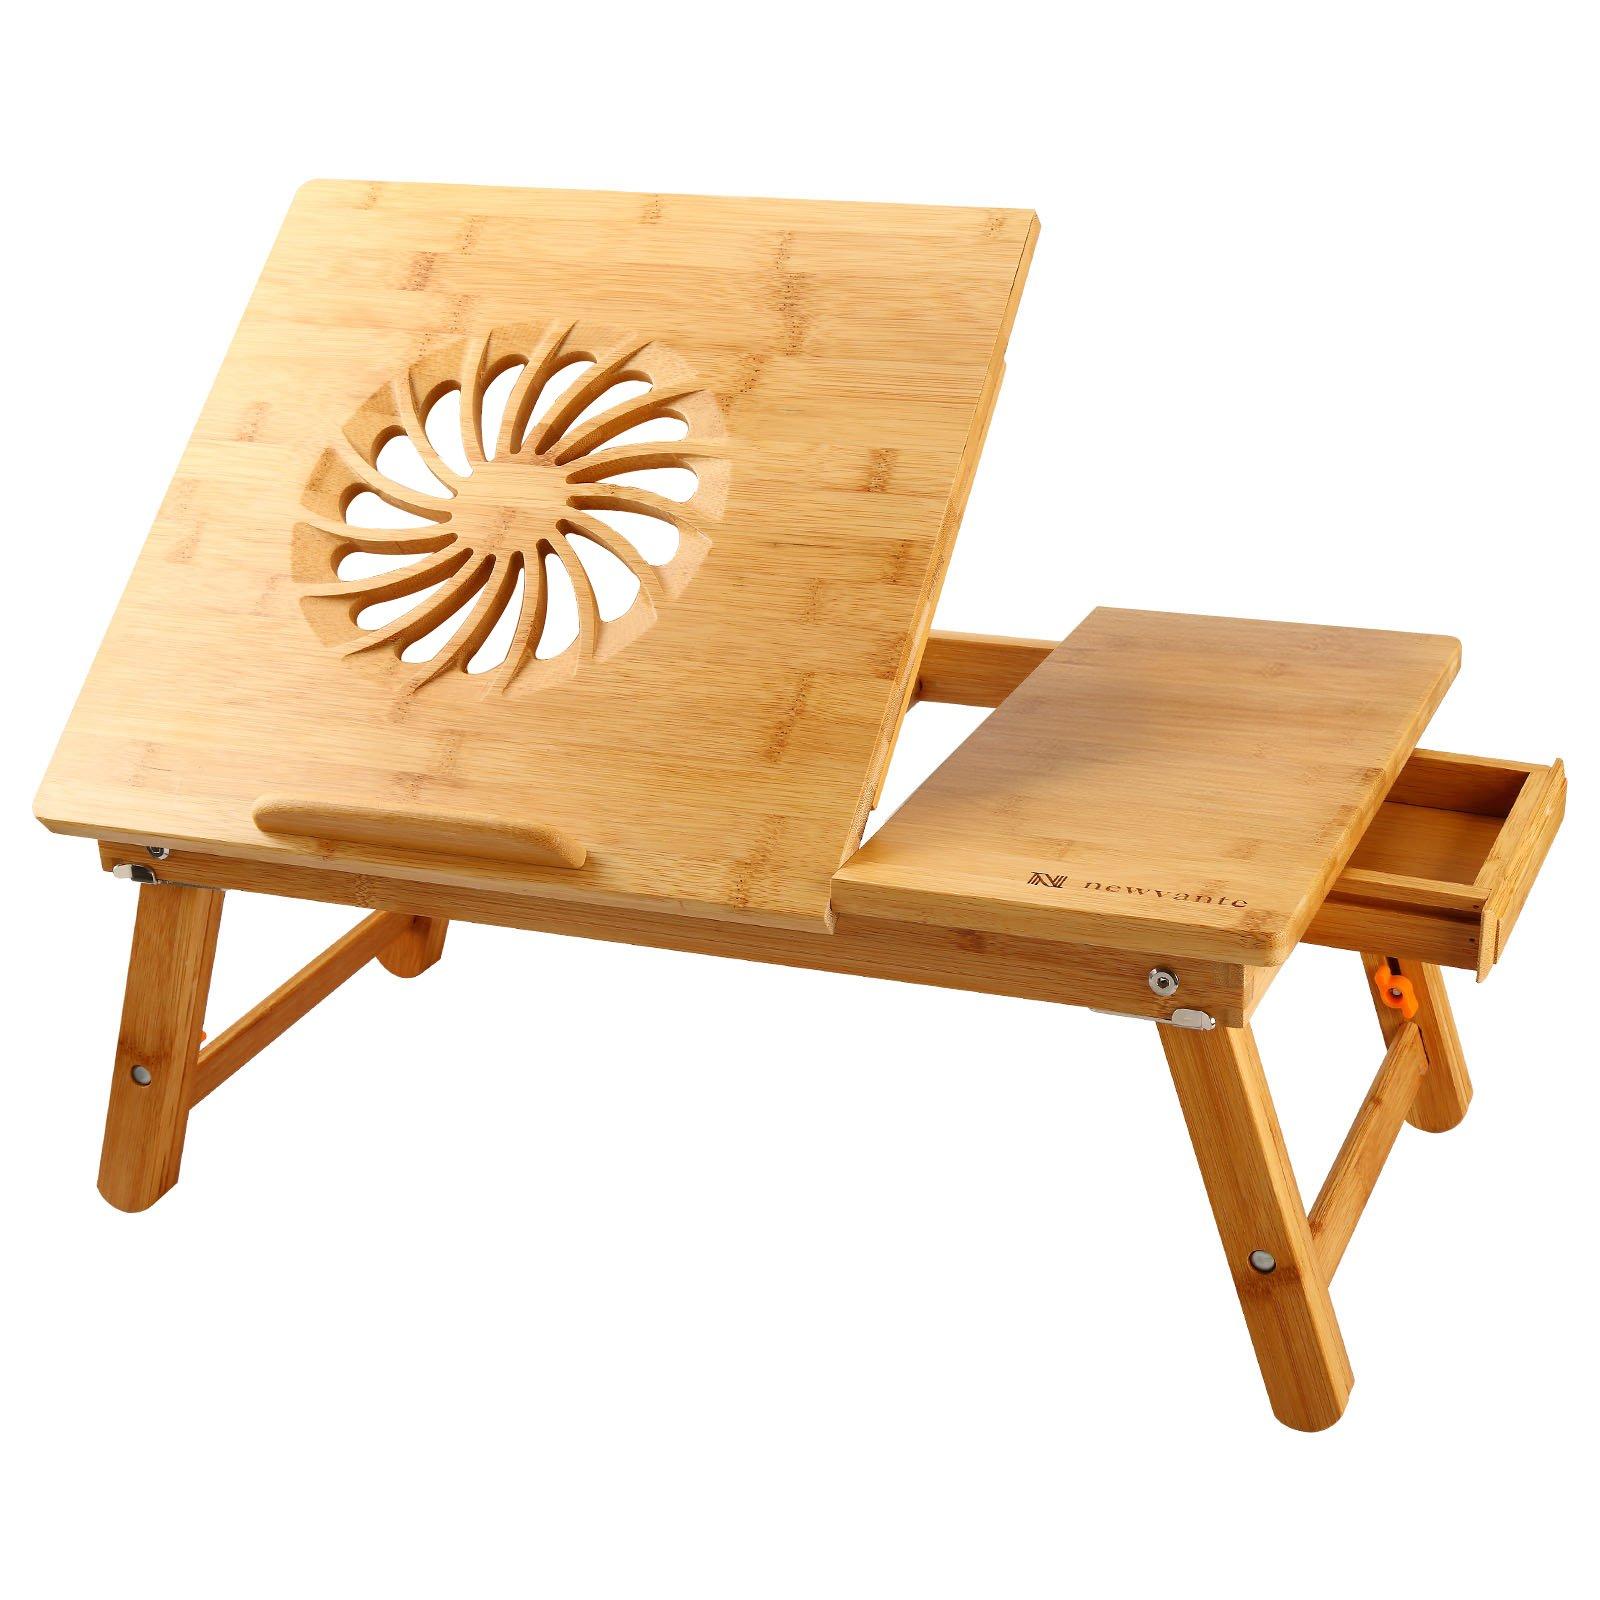 Laptop Desk Nnewvante Adjustable Laptop Desk Table Bamboo Foldable Breakfast Serving Bed Tray w' Drawer